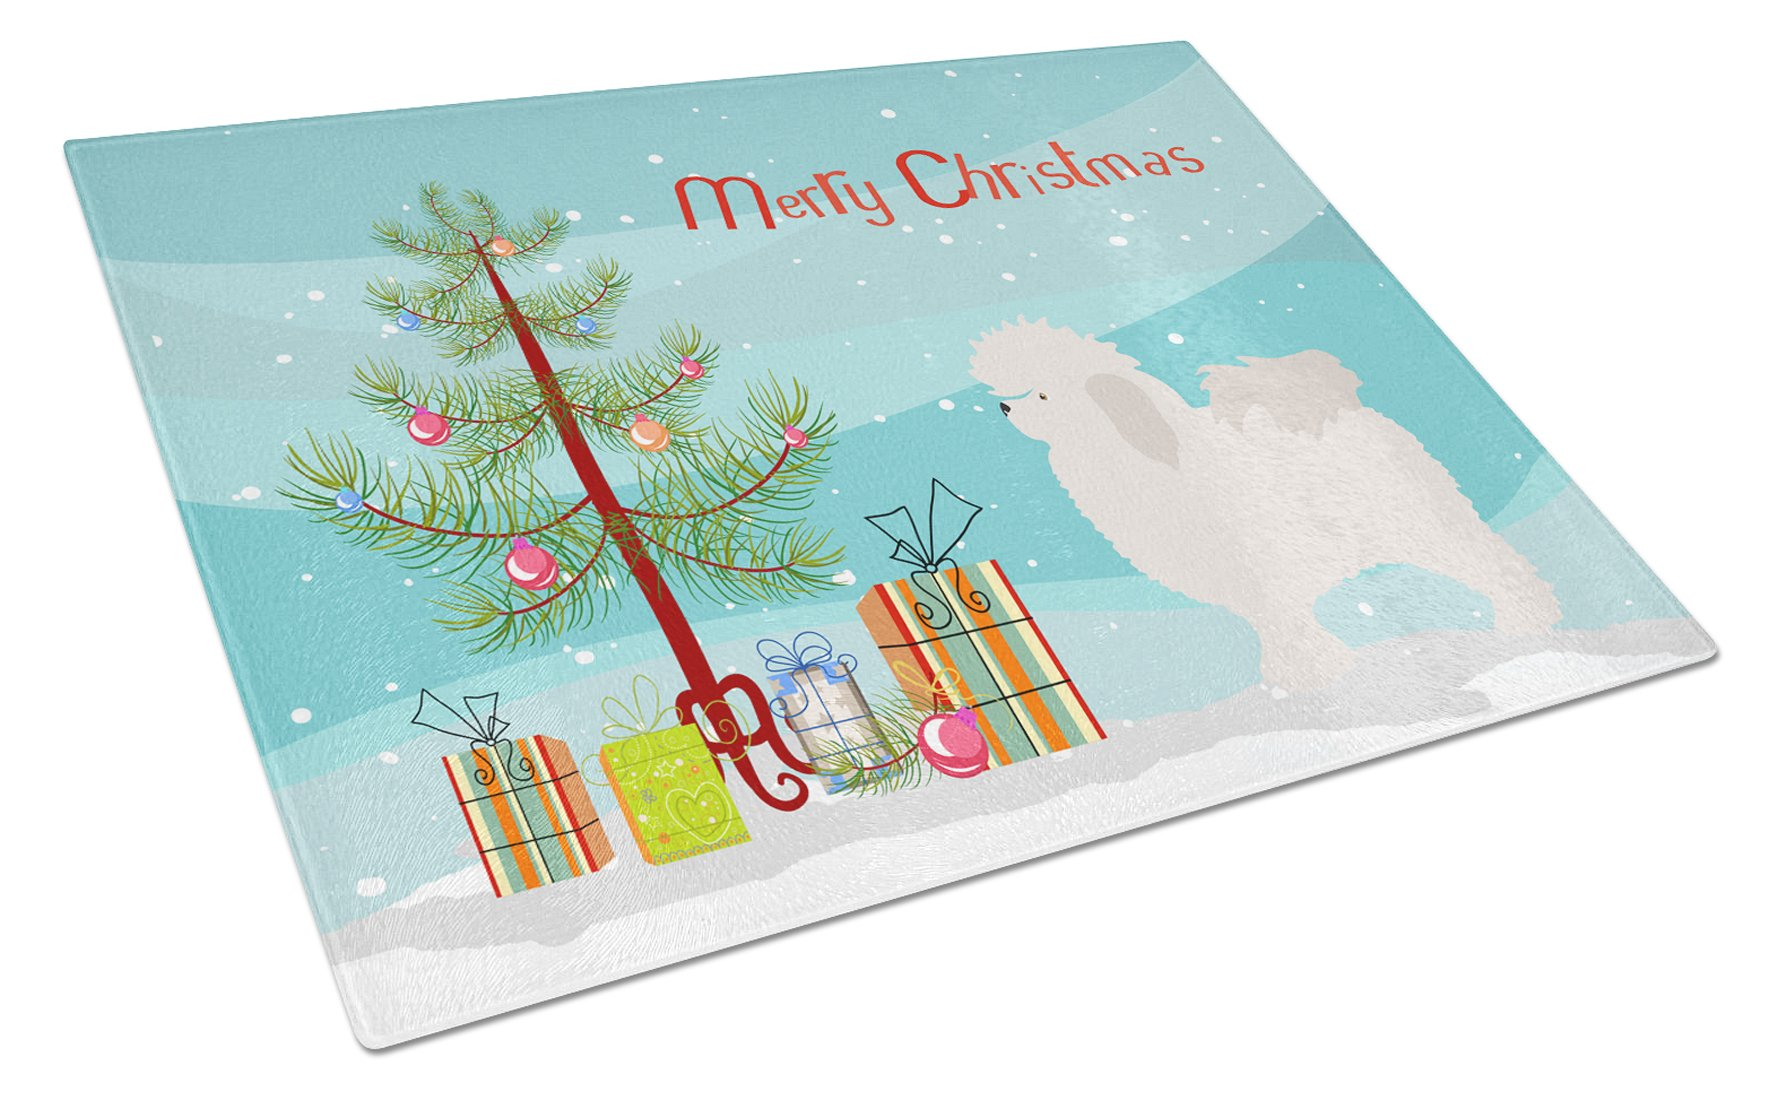 Carolines Treasures English Springer Spaniel Christmas Floor Mat 19hx27w Multicolor